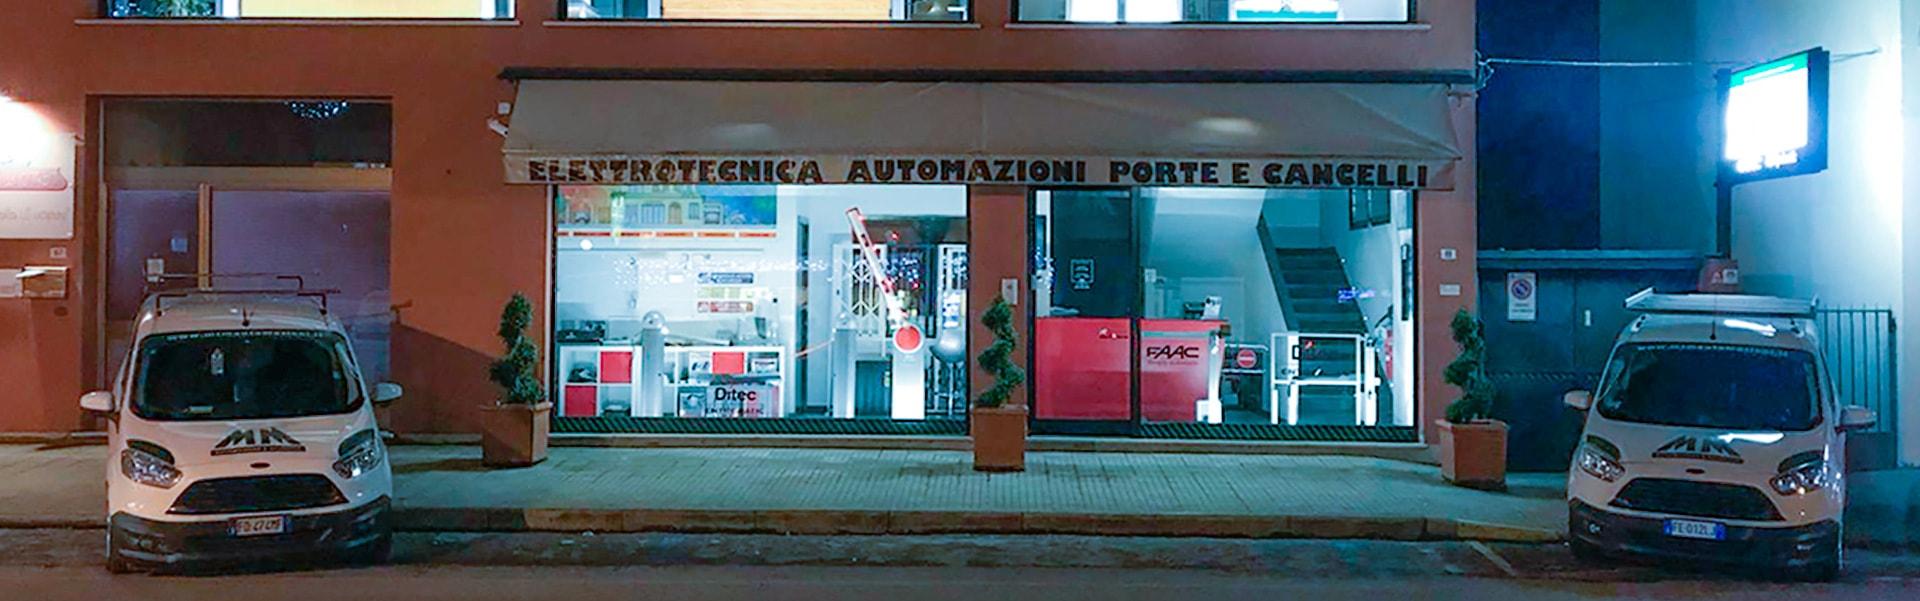 La sede di MTM Automazioni di Pieve a Nievole